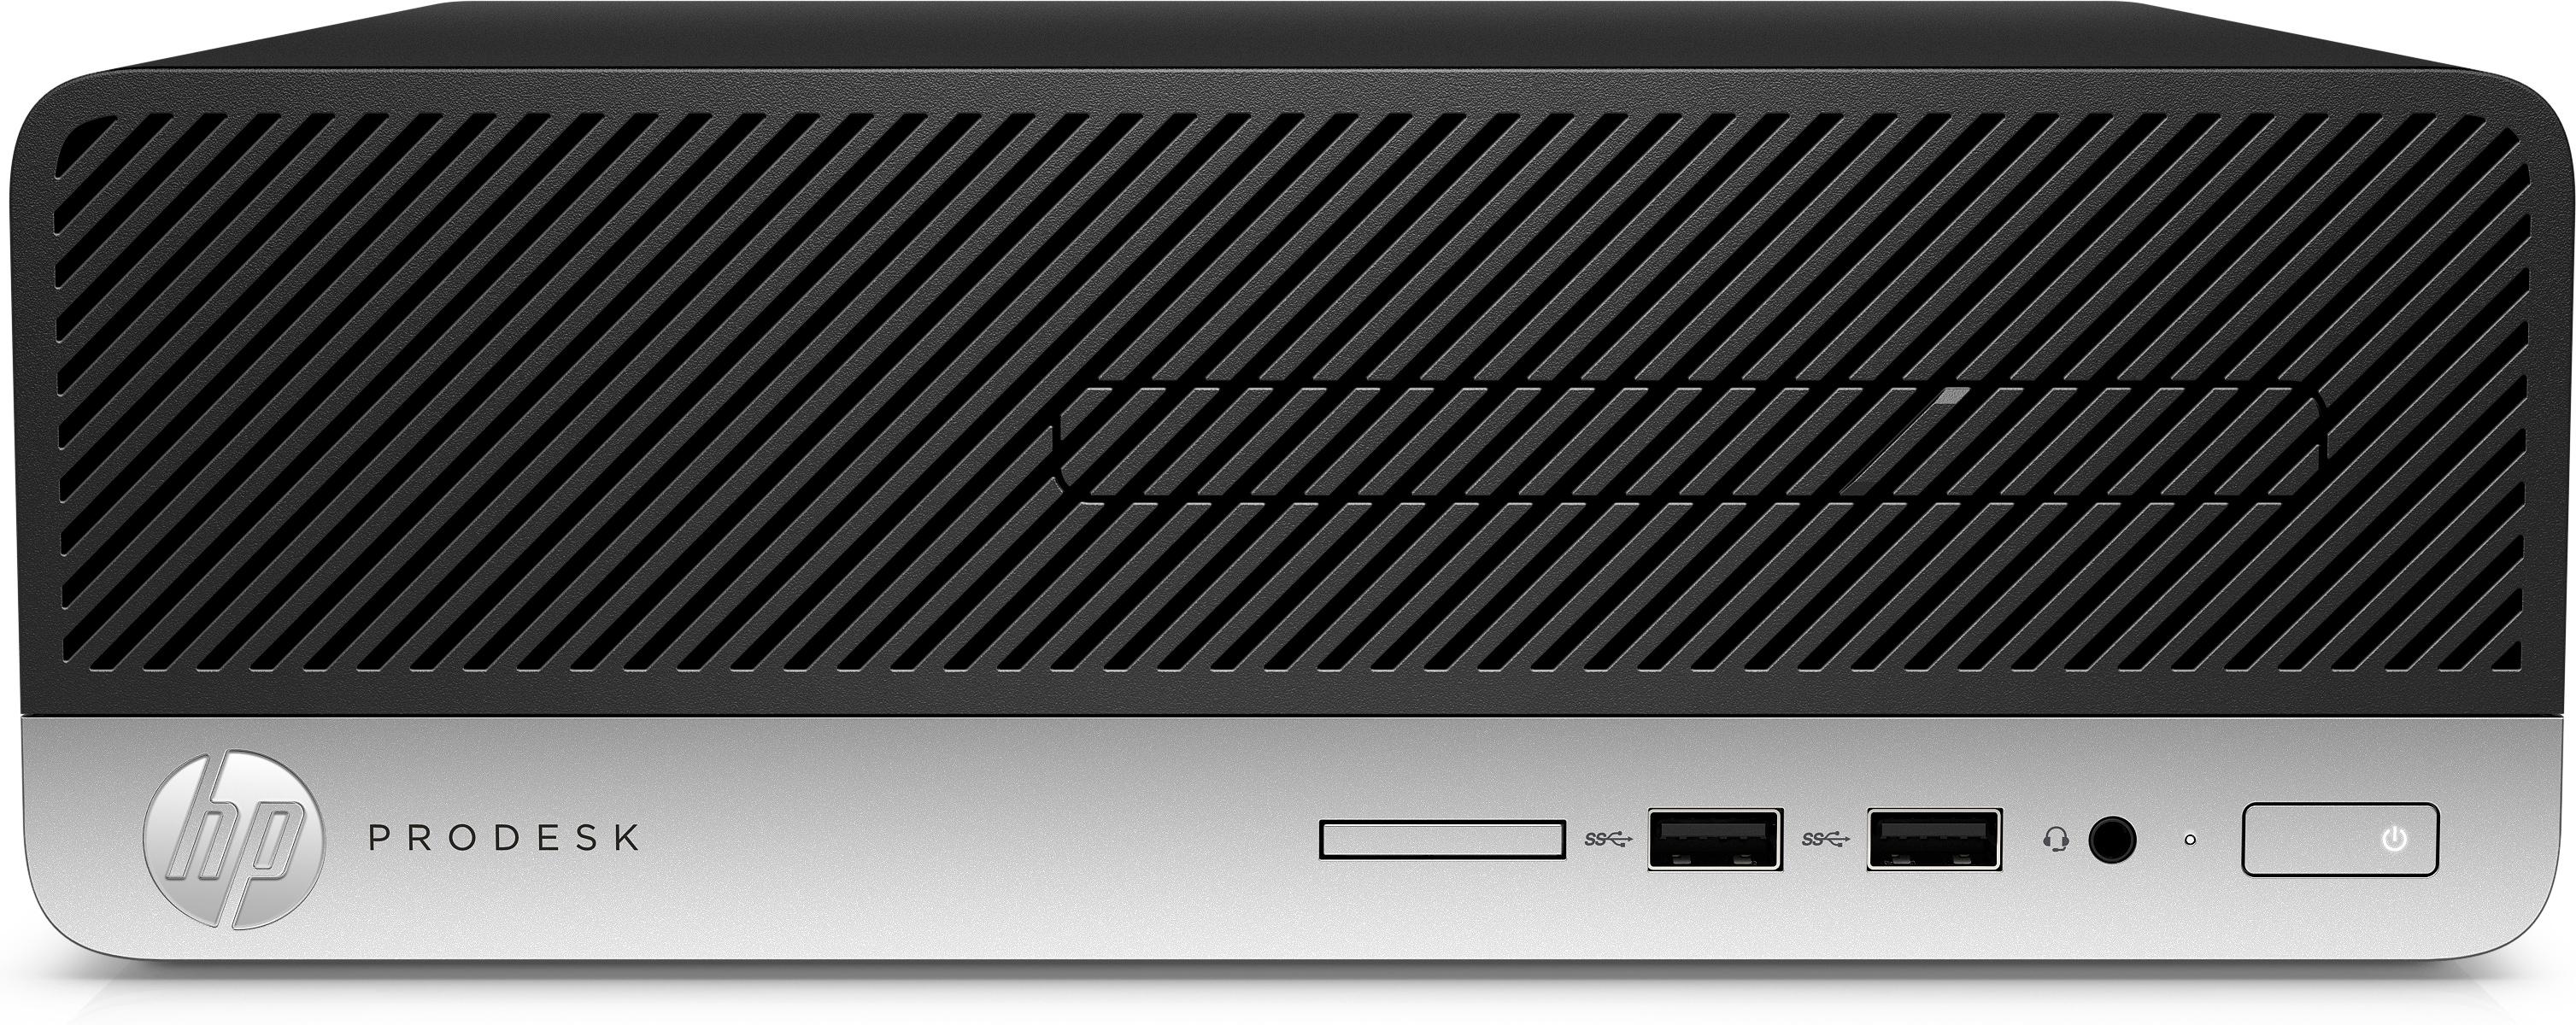 HP ProDesk 400 G6 - Komplettsystem - Core i5 3 GHz - RAM: 8 GB DDR4 - HDD: 512 GB NVMe - UHD Graphics 600